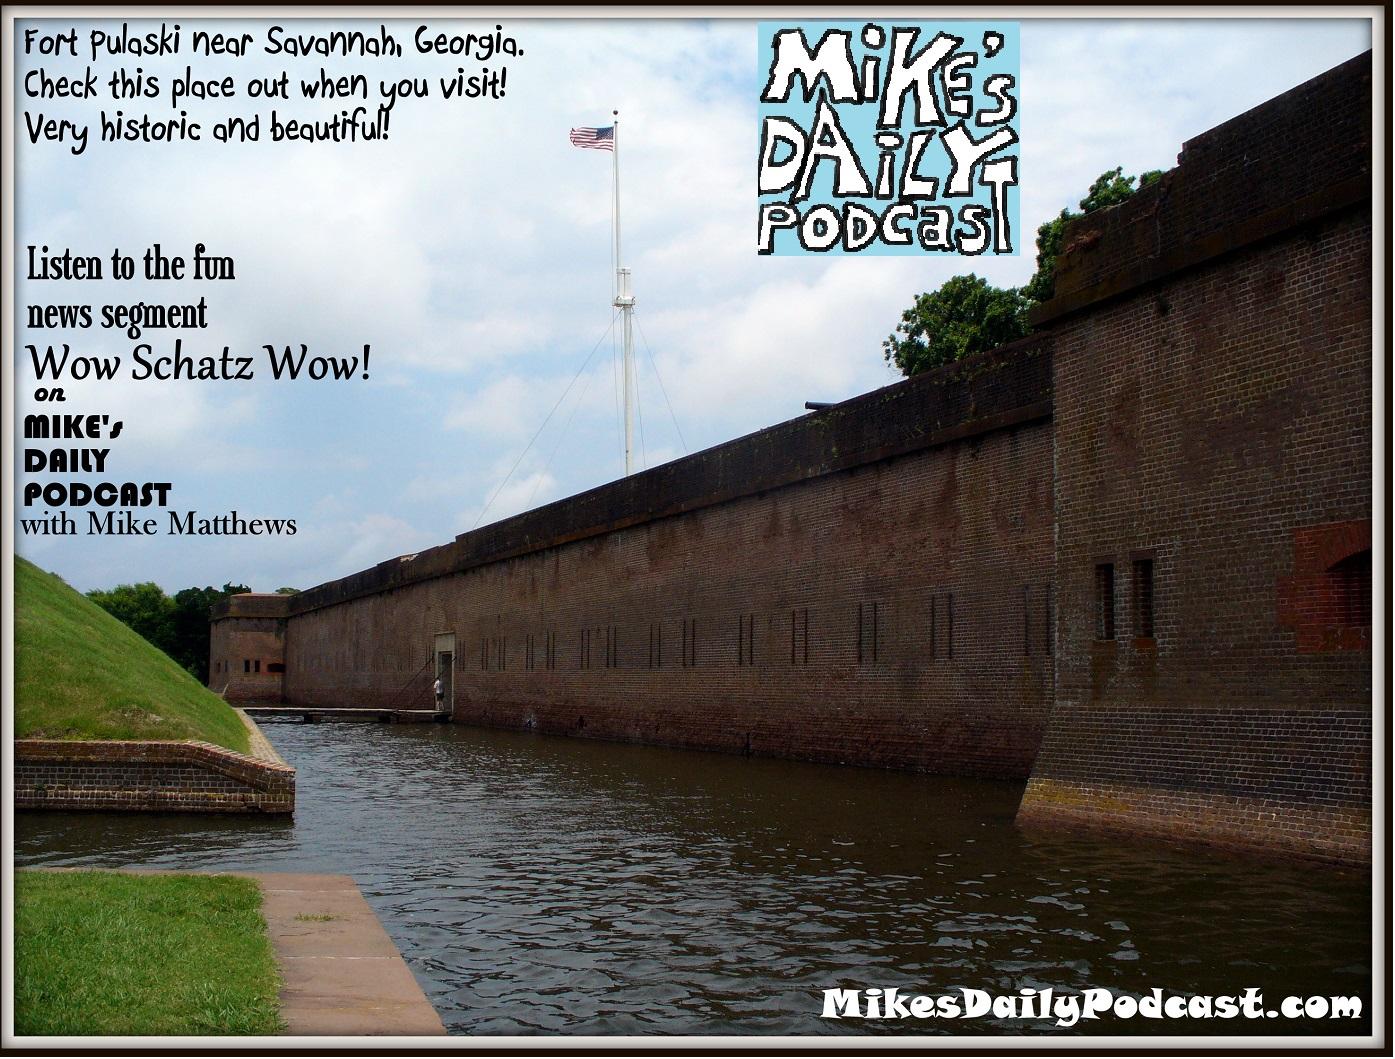 MIKEs DAILY PODCAST 983 Fort Pulaski Georgia